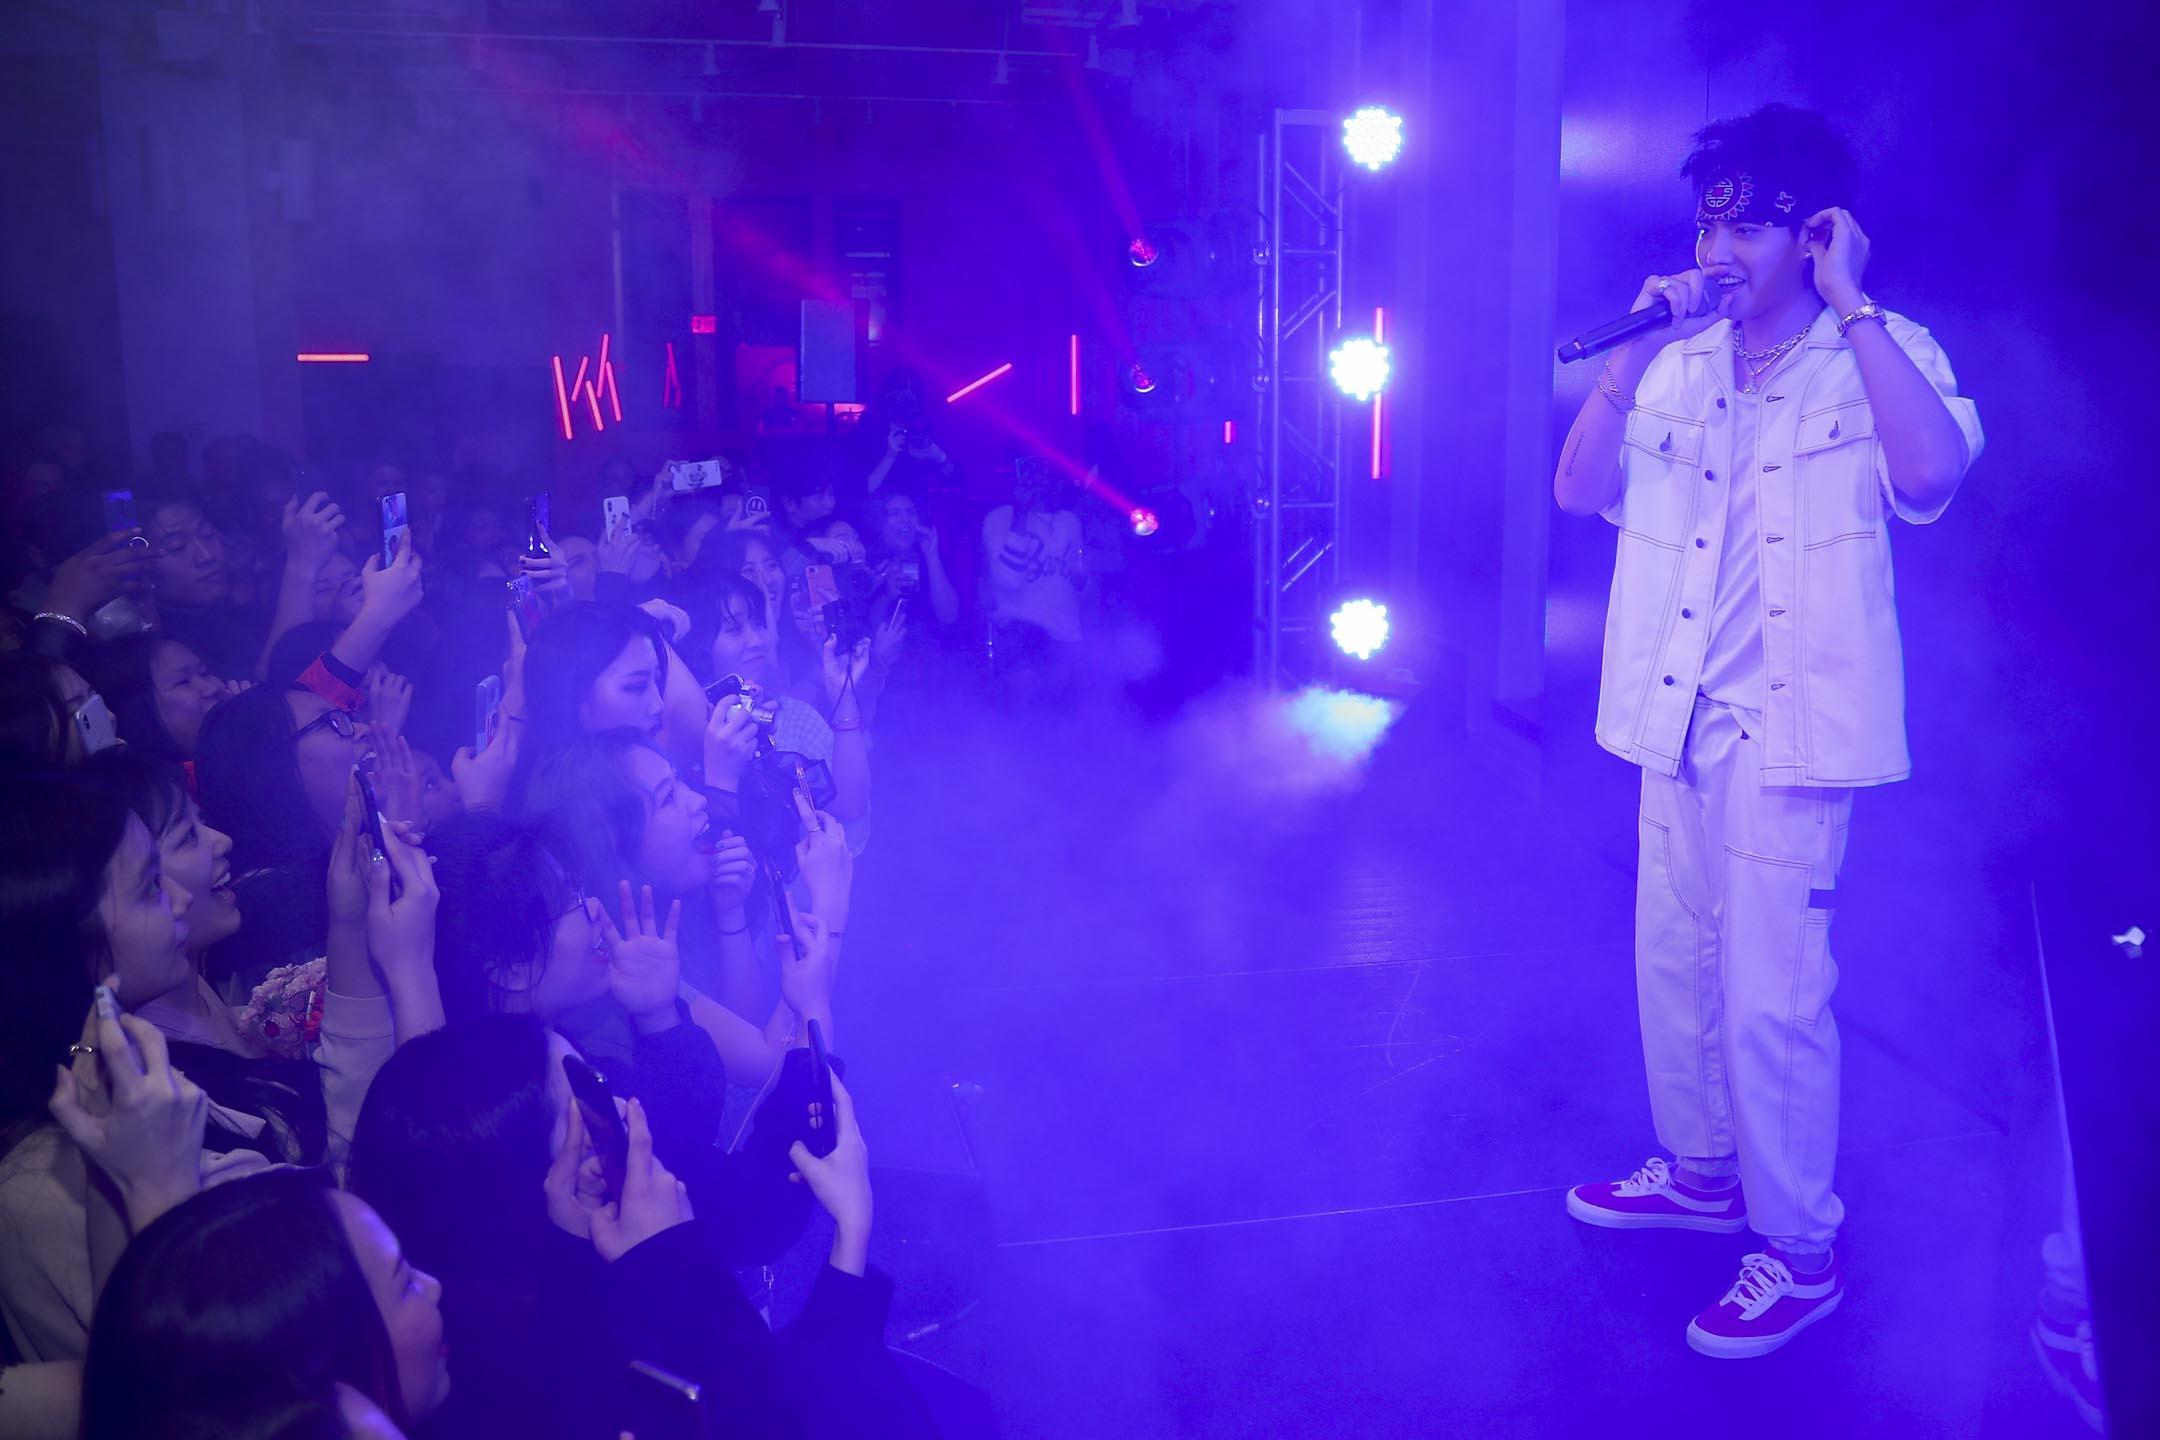 2018年11月6日,吳亦凡在一個專輯發行派對上表演,觀眾爭相拍照。 攝:Cassidy Sparrow/Getty Images for Interscope Records